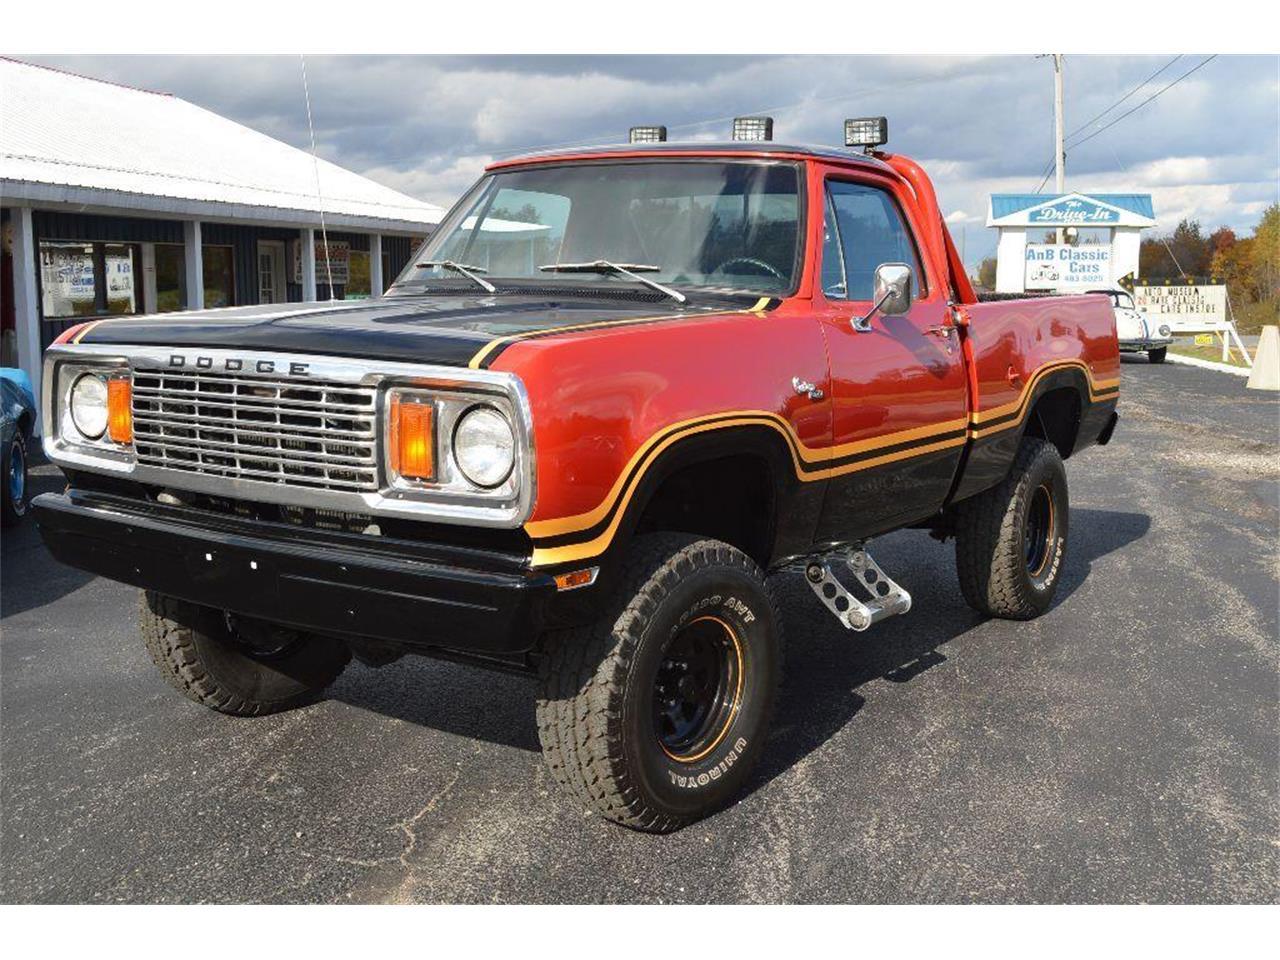 1978 Dodge Power Wagon For Sale Classiccars Com Cc 887993